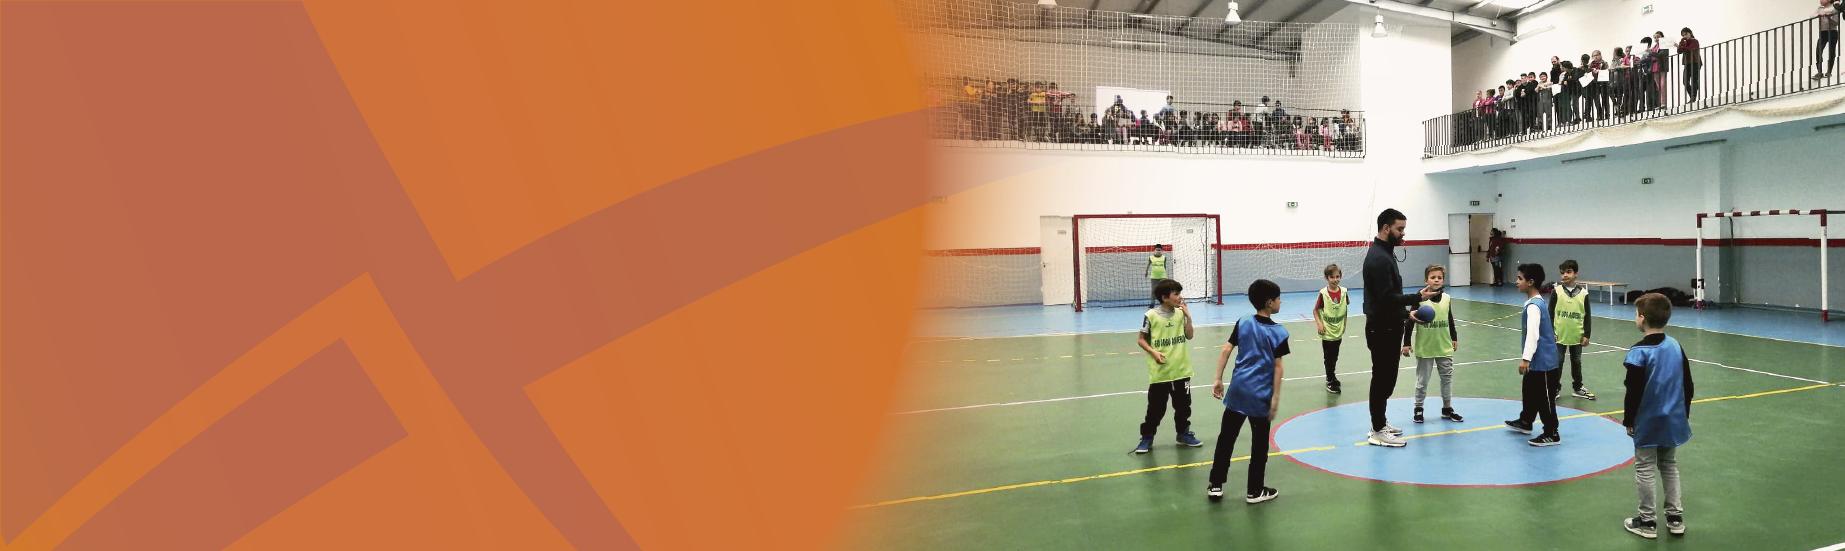 Andebol 4 Kids – Festand em Tarouca